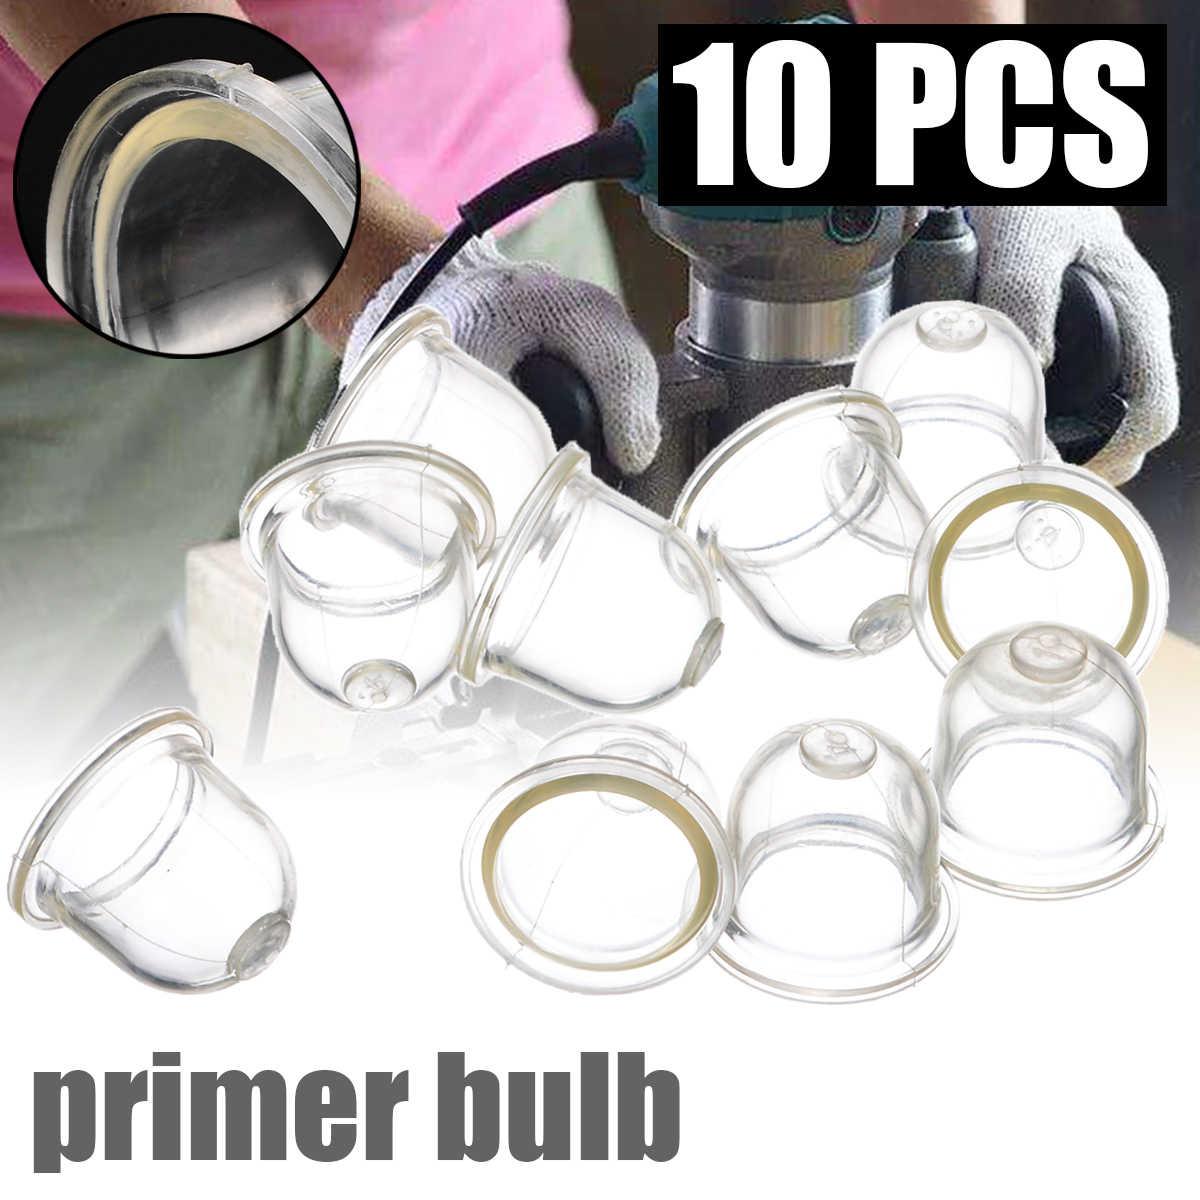 10 Pcs 19/22 Mm Clear Brandstofpomp Carburateur Olie Bubble Primer Lamp Voor Kettingzagen Trimmer Bosmaaier Clear Tool